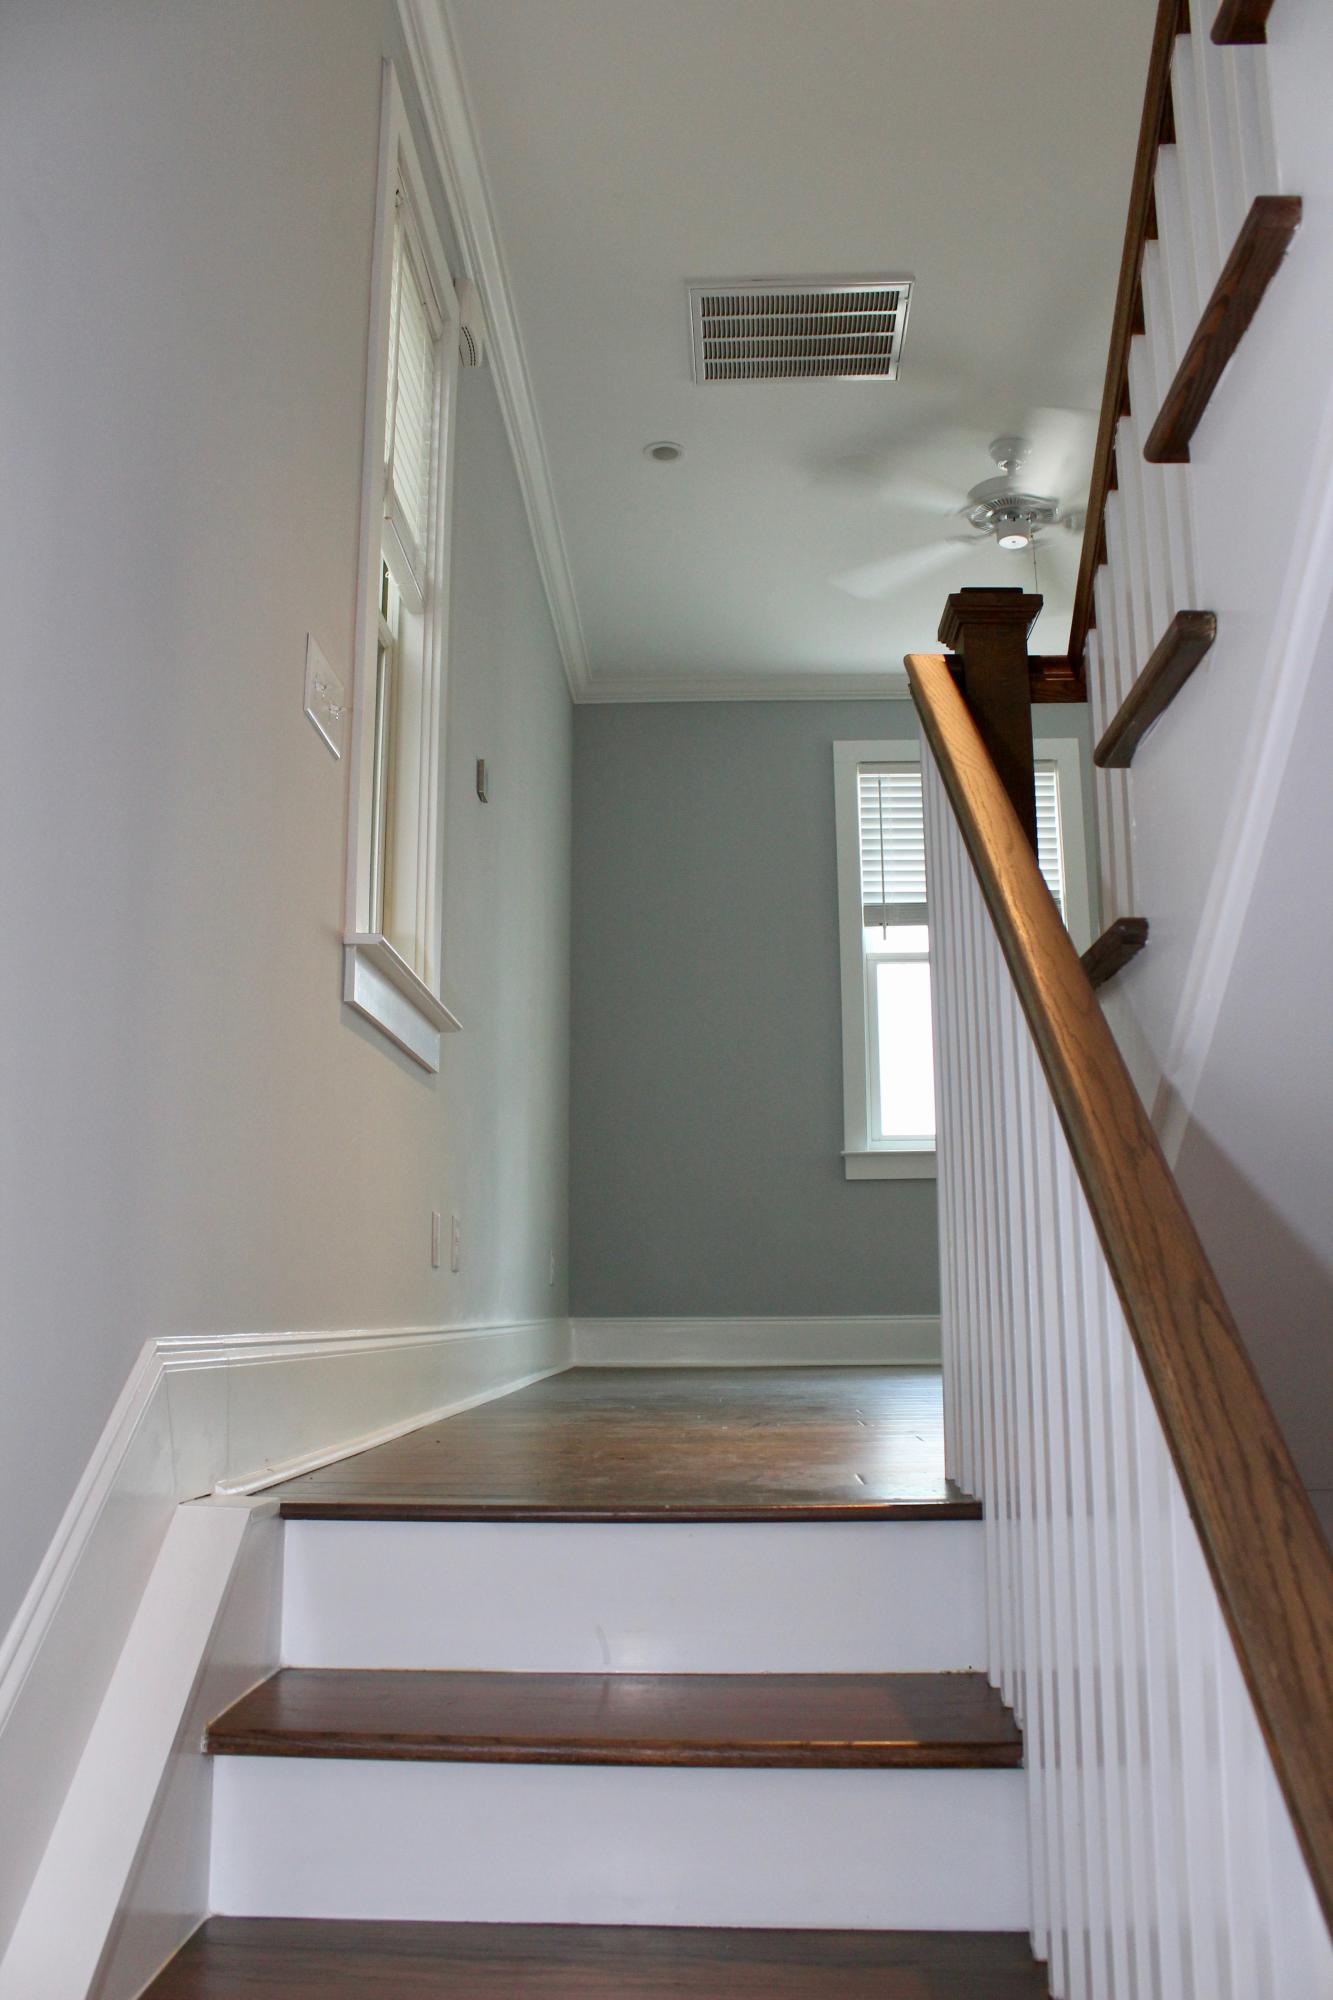 Morris Square Homes For Sale - 41 Dereef, Charleston, SC - 21